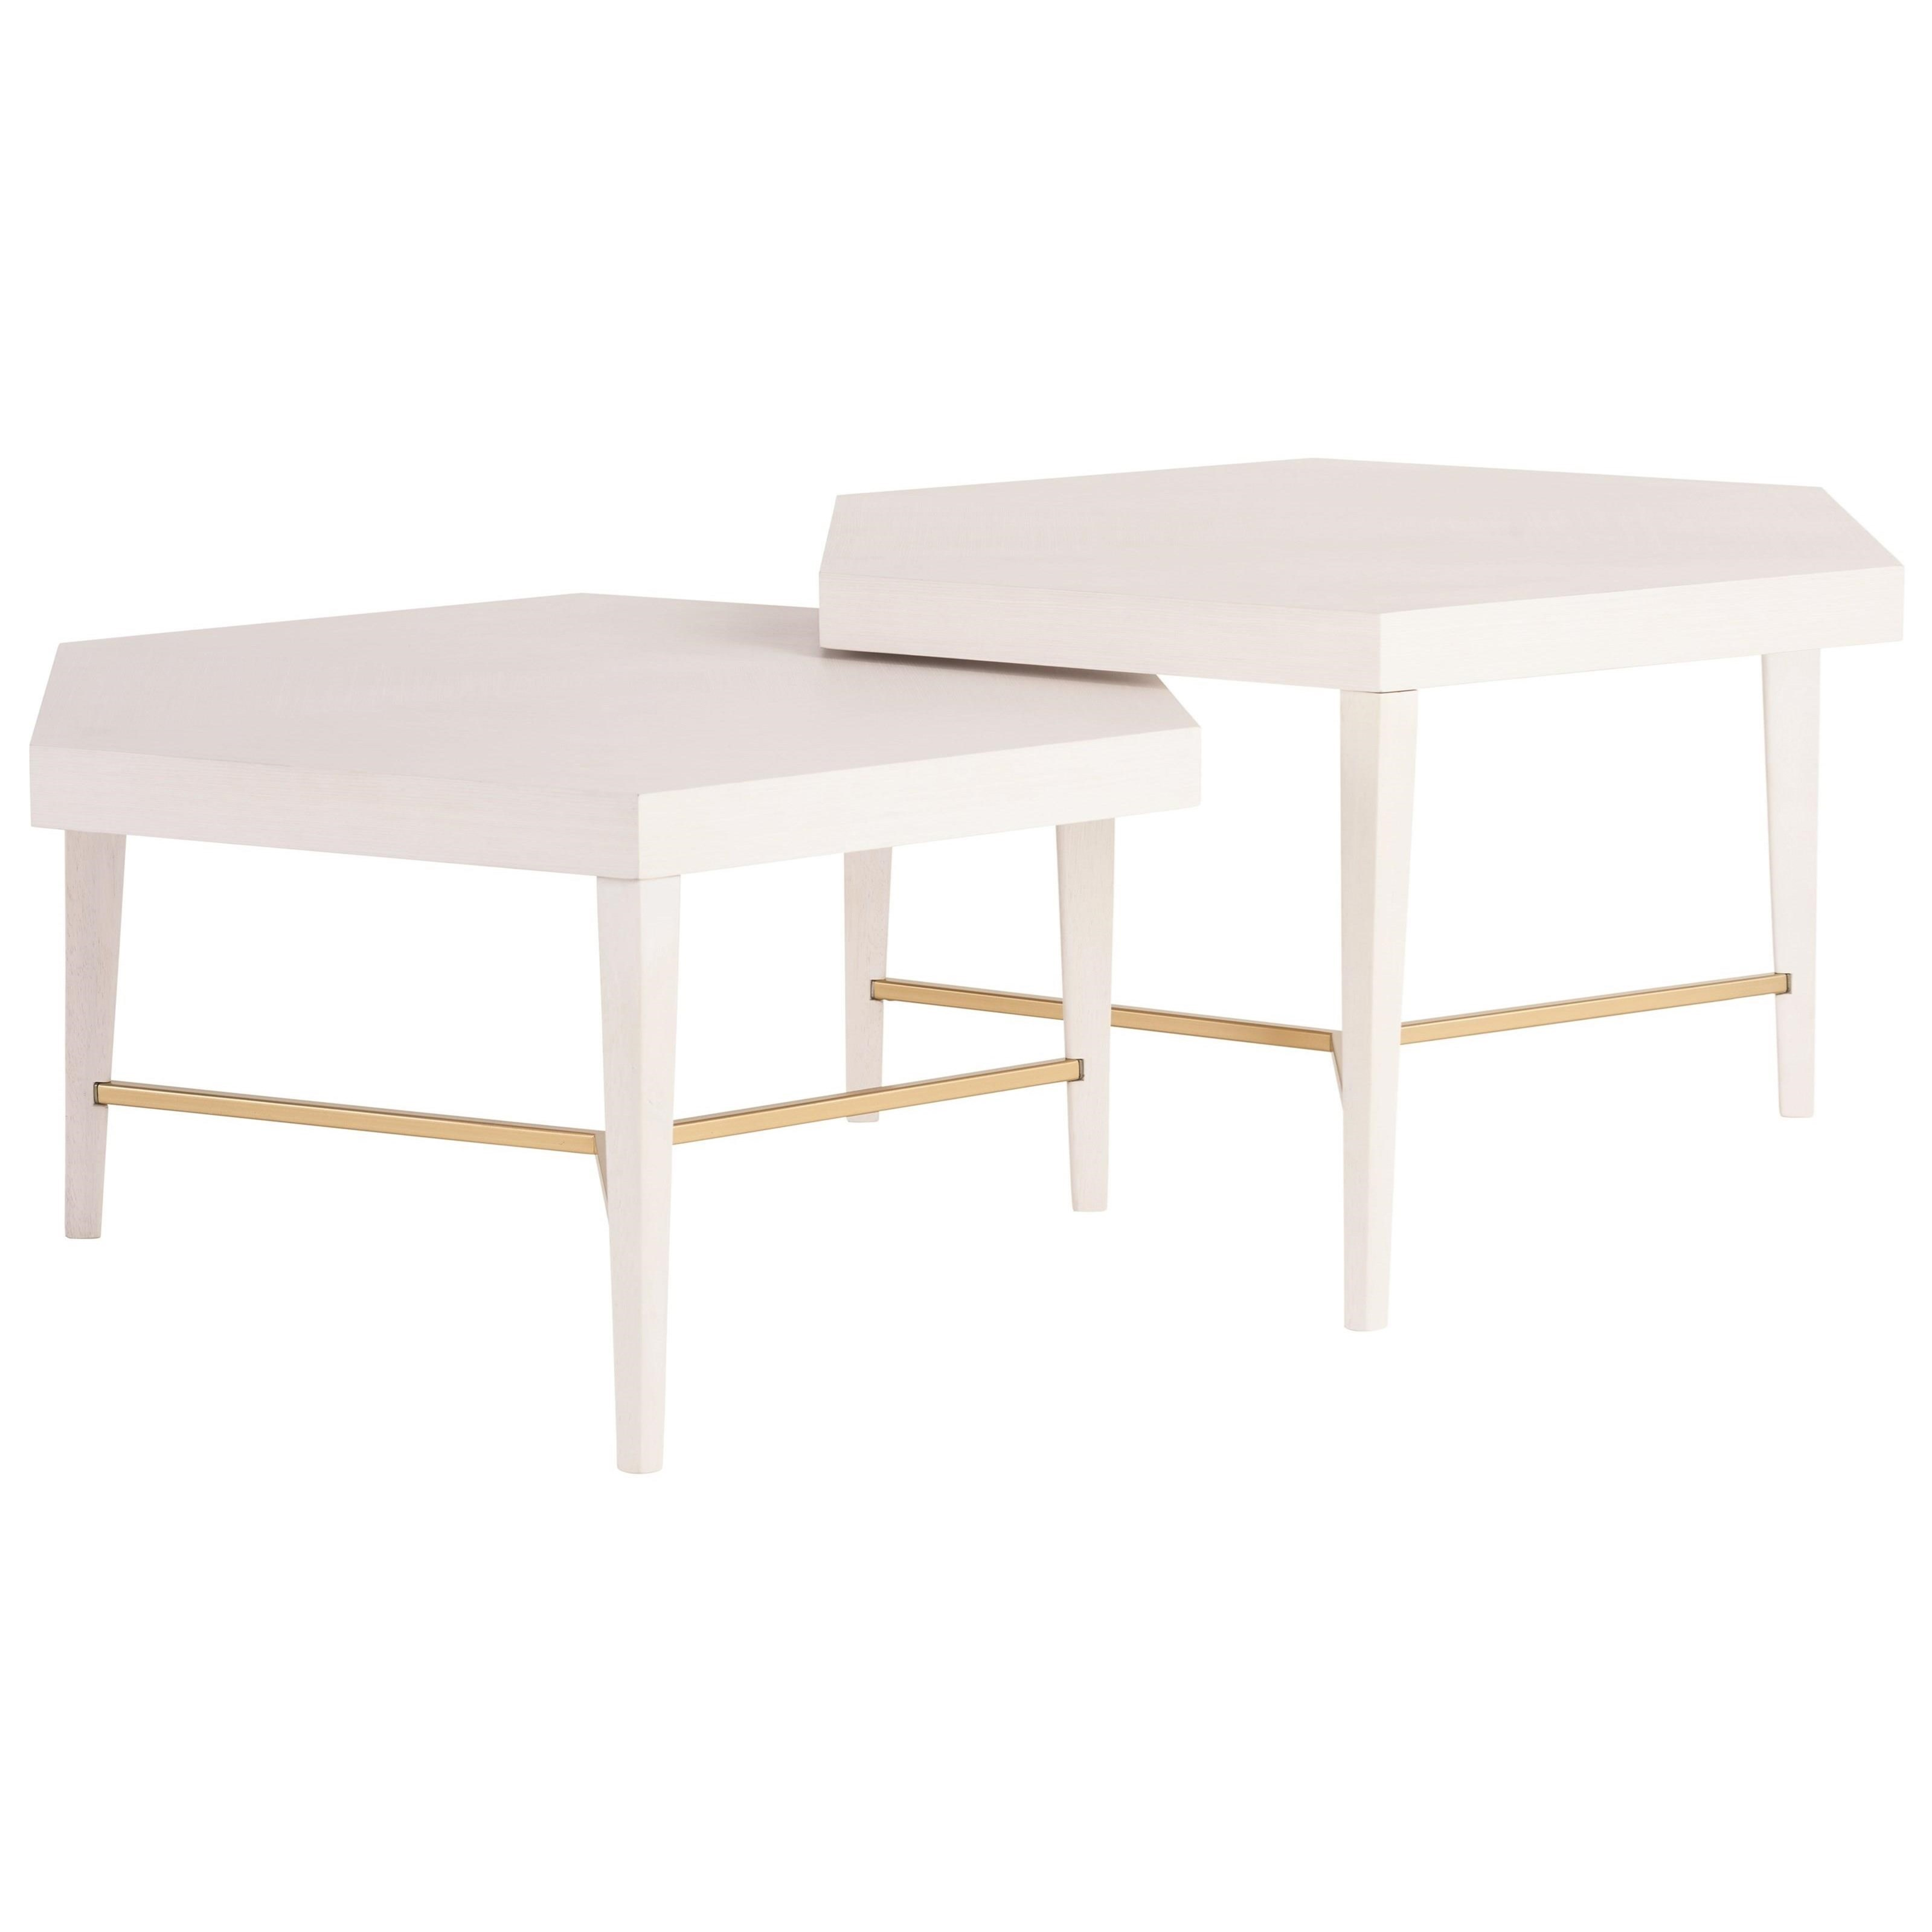 Love. Joy. Bliss.-Miranda Kerr Home Sydney Bunching Cocktail Tables by Universal at Stoney Creek Furniture